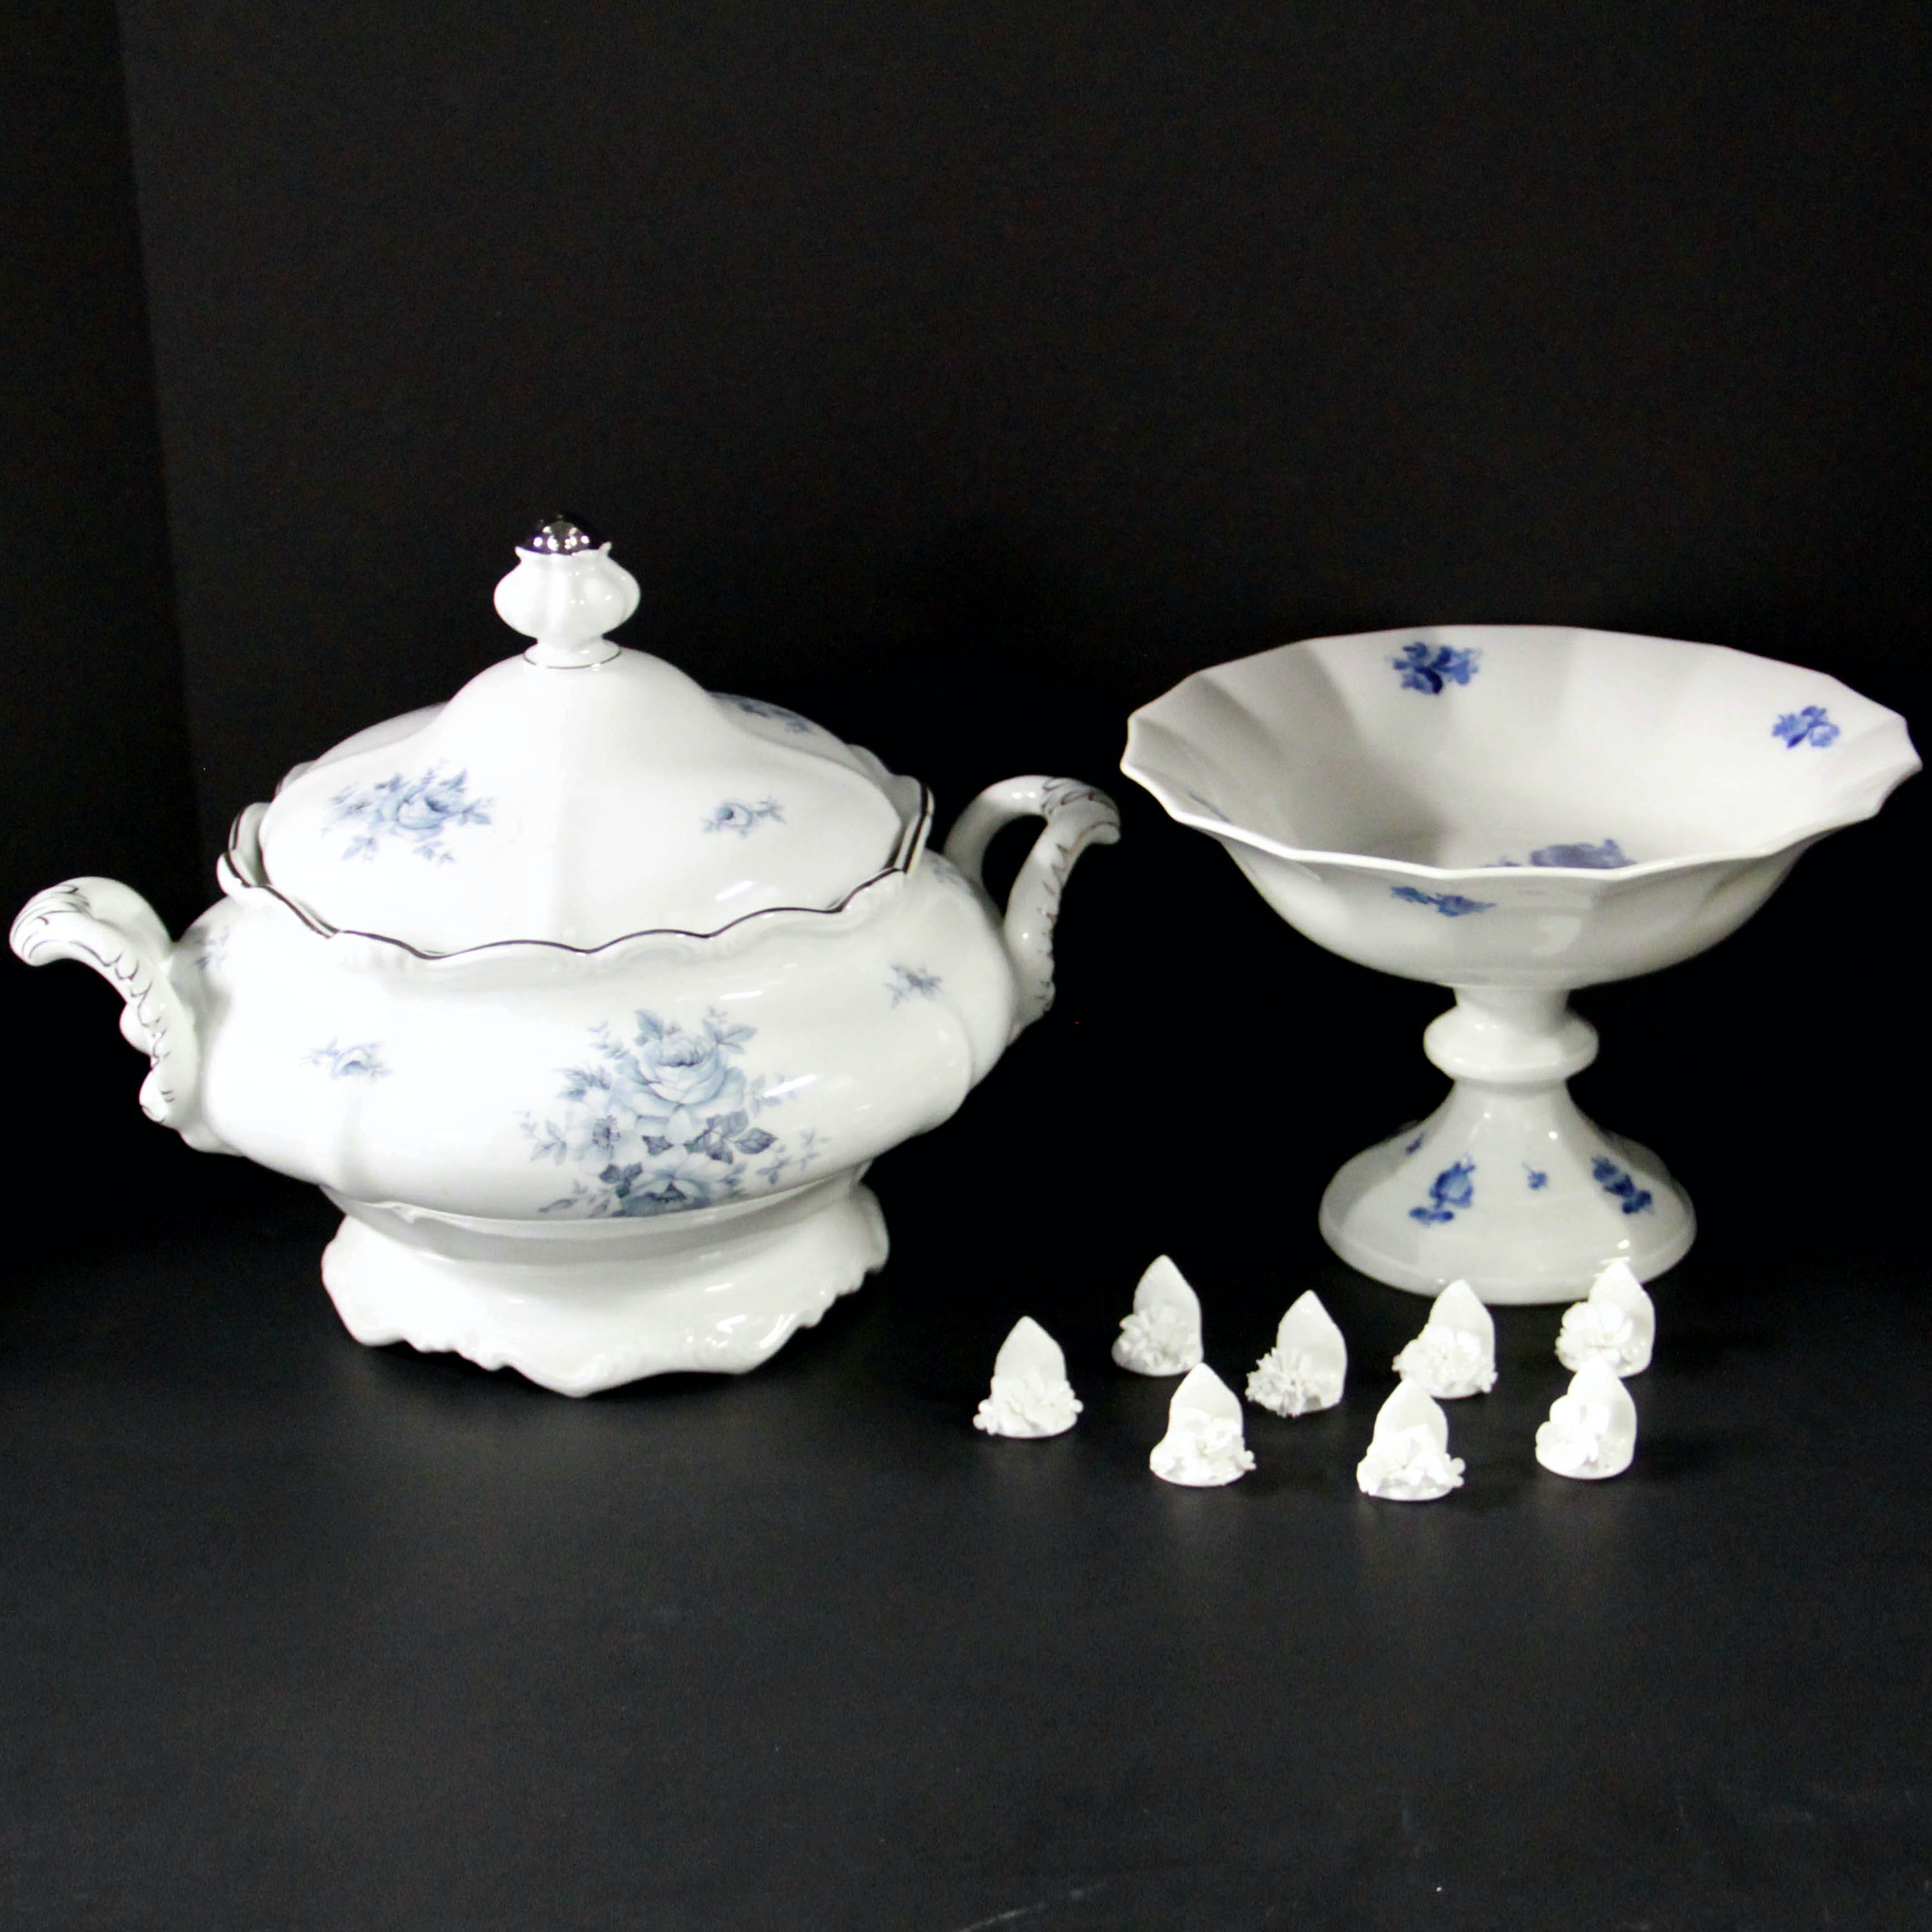 Blue and White Porcelain Tableware Including Haviland